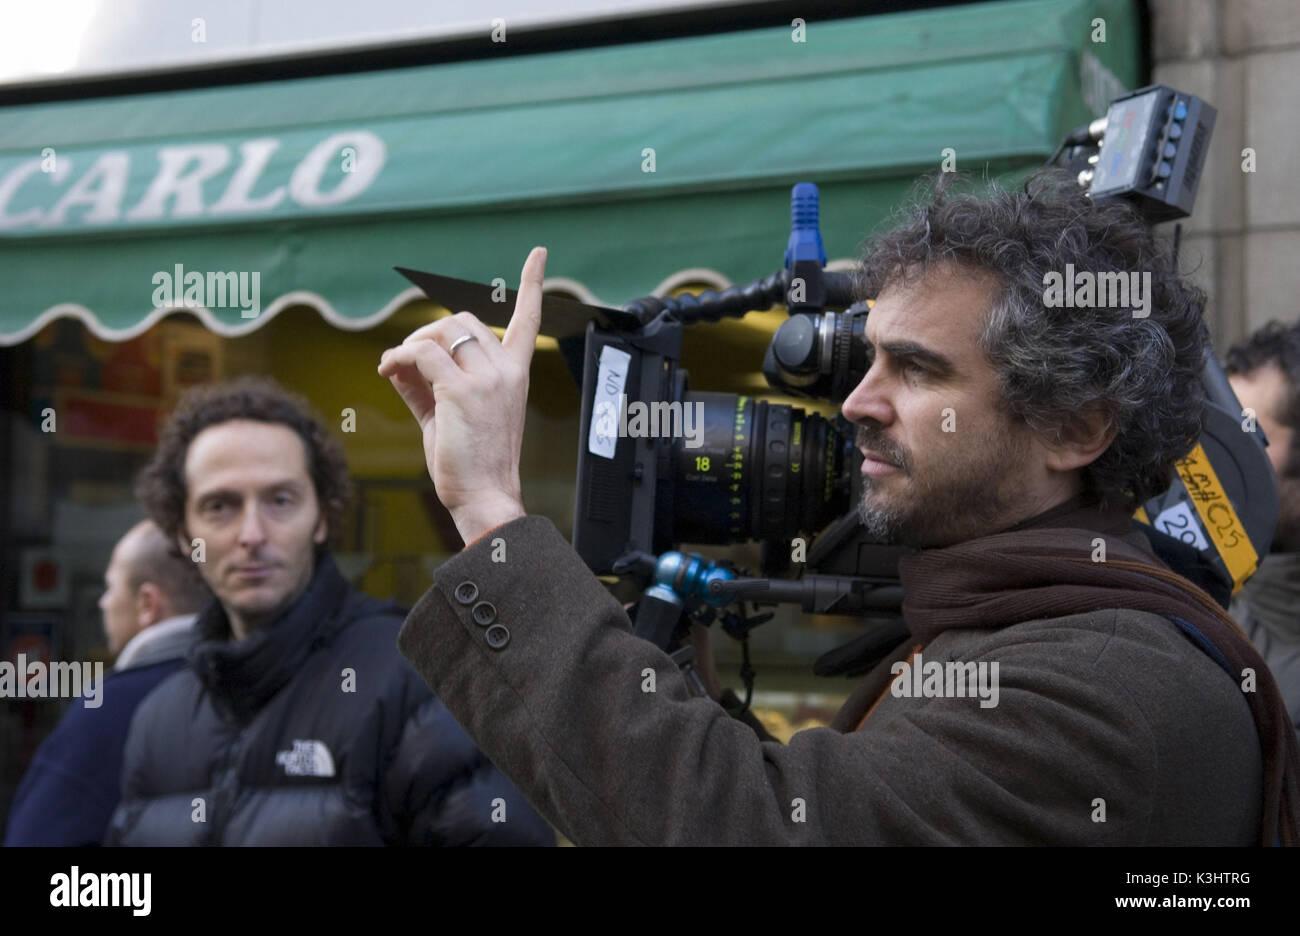 THE CHILDREN OF MEN Cinematographers EMMANUEL LUBEZKI, Director ALFONSO CUARON Stock Photo